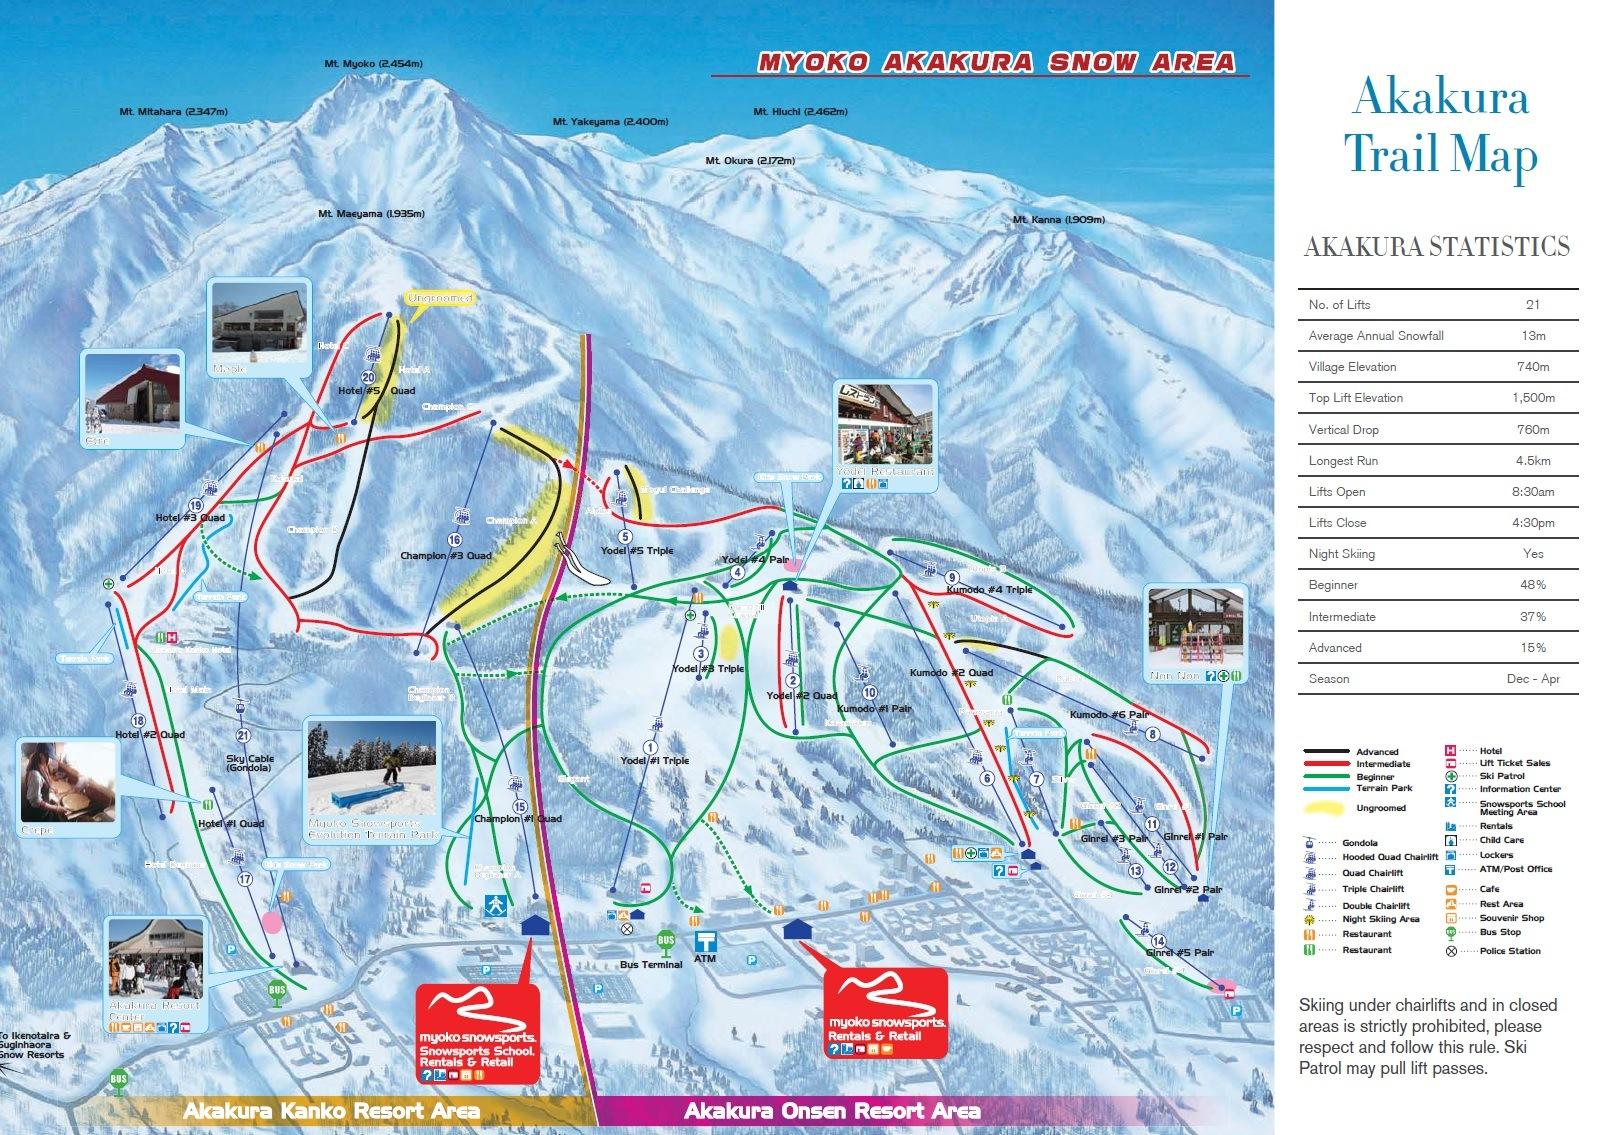 Akakura-Trail-Map The Resort & Lift Tickets